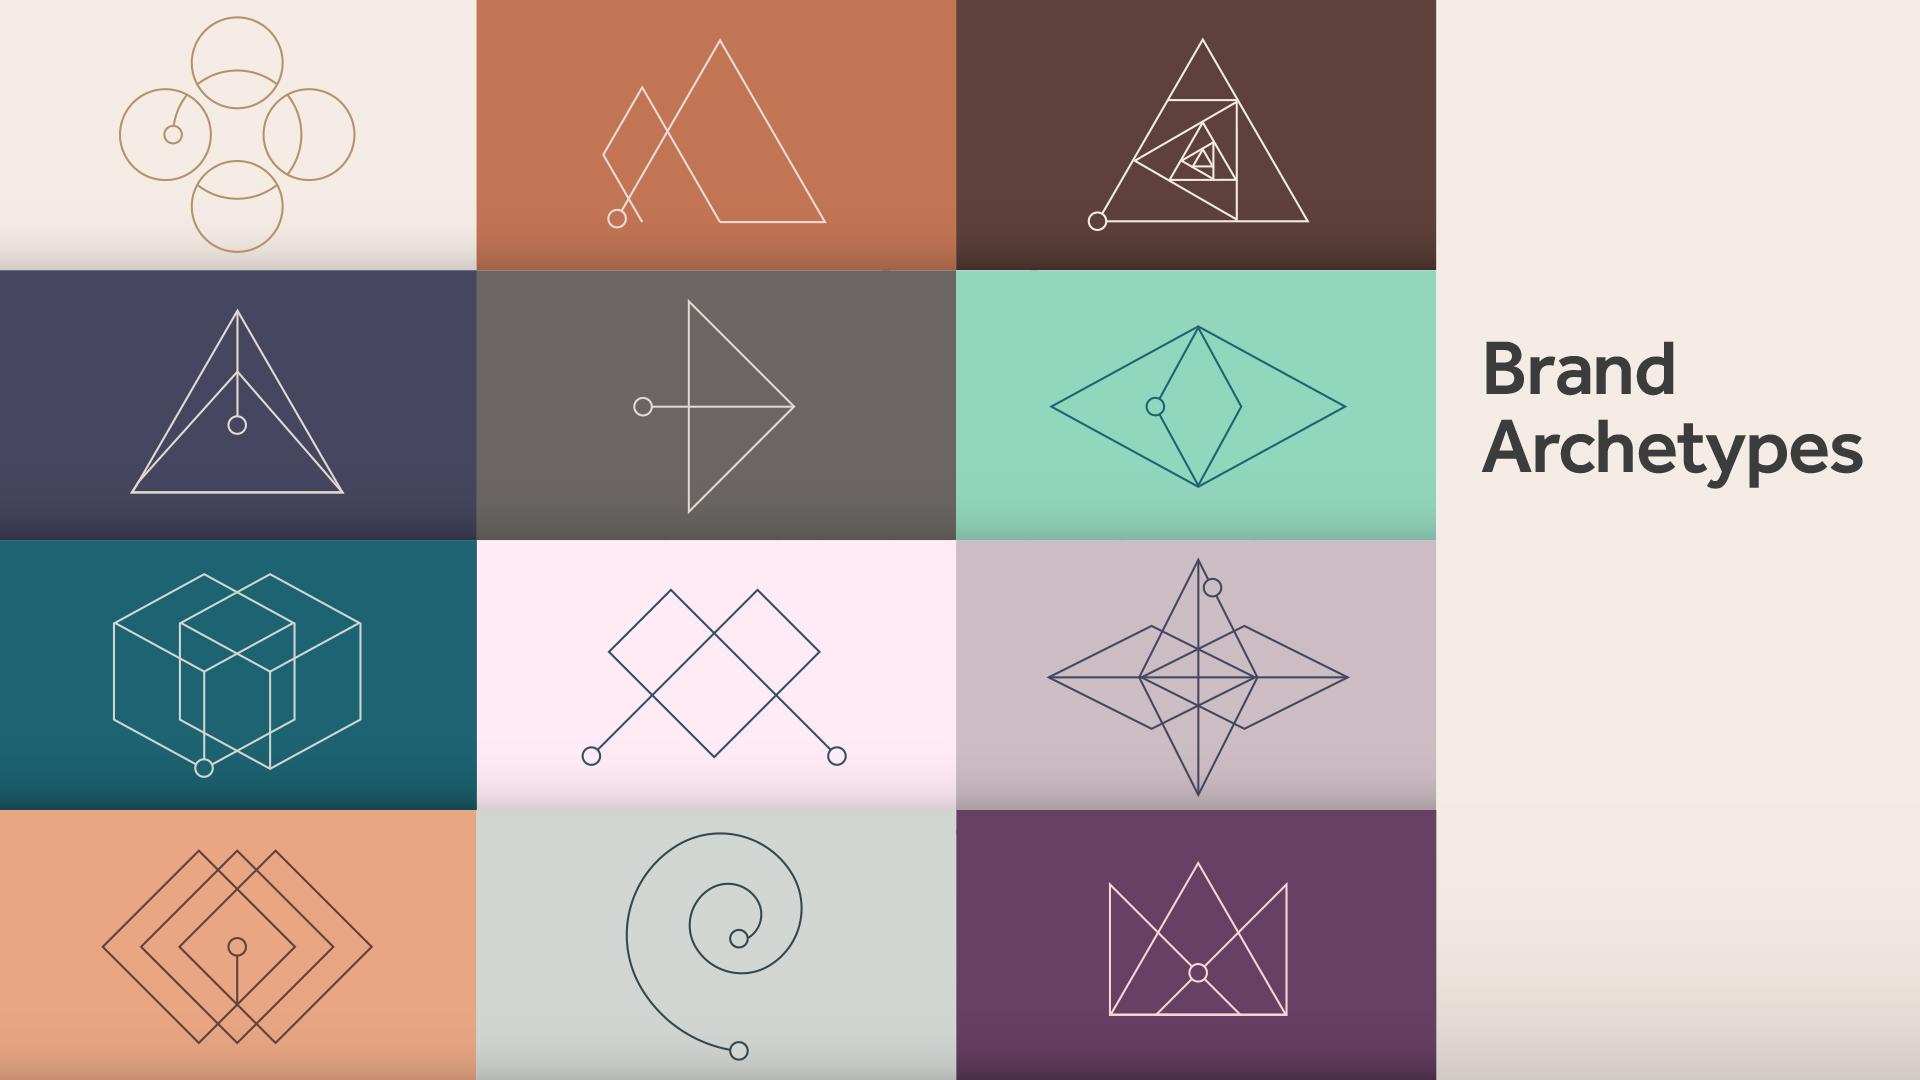 The 12 Brand Archetypes